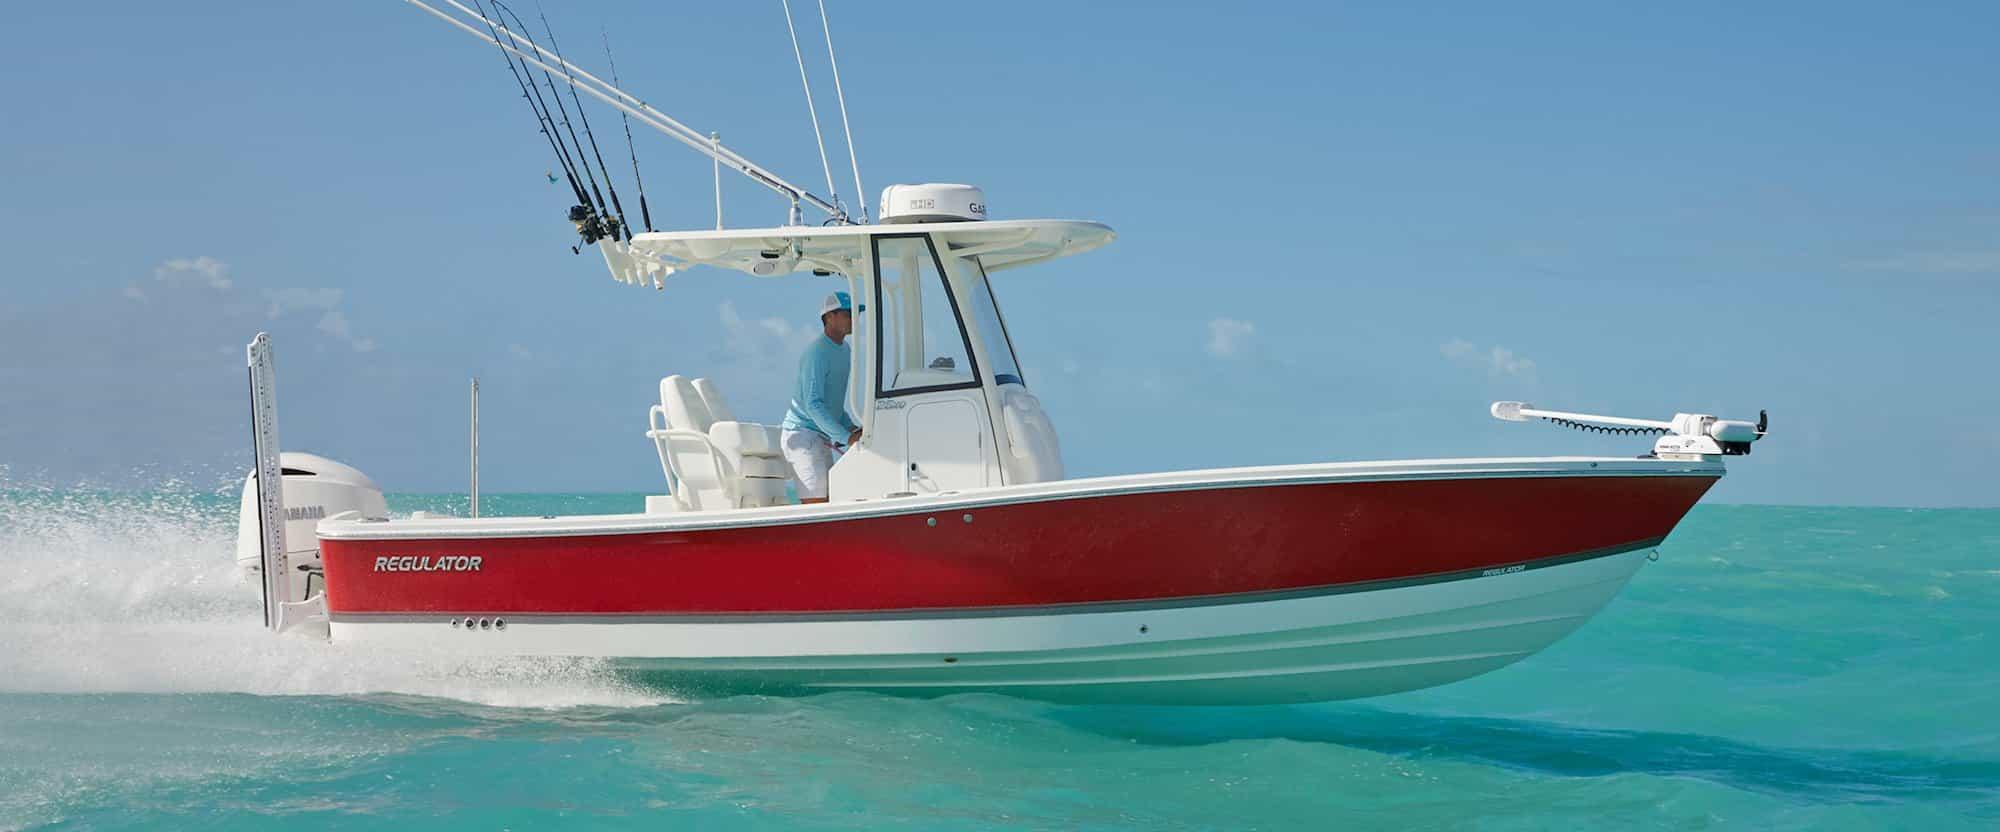 regulator boat